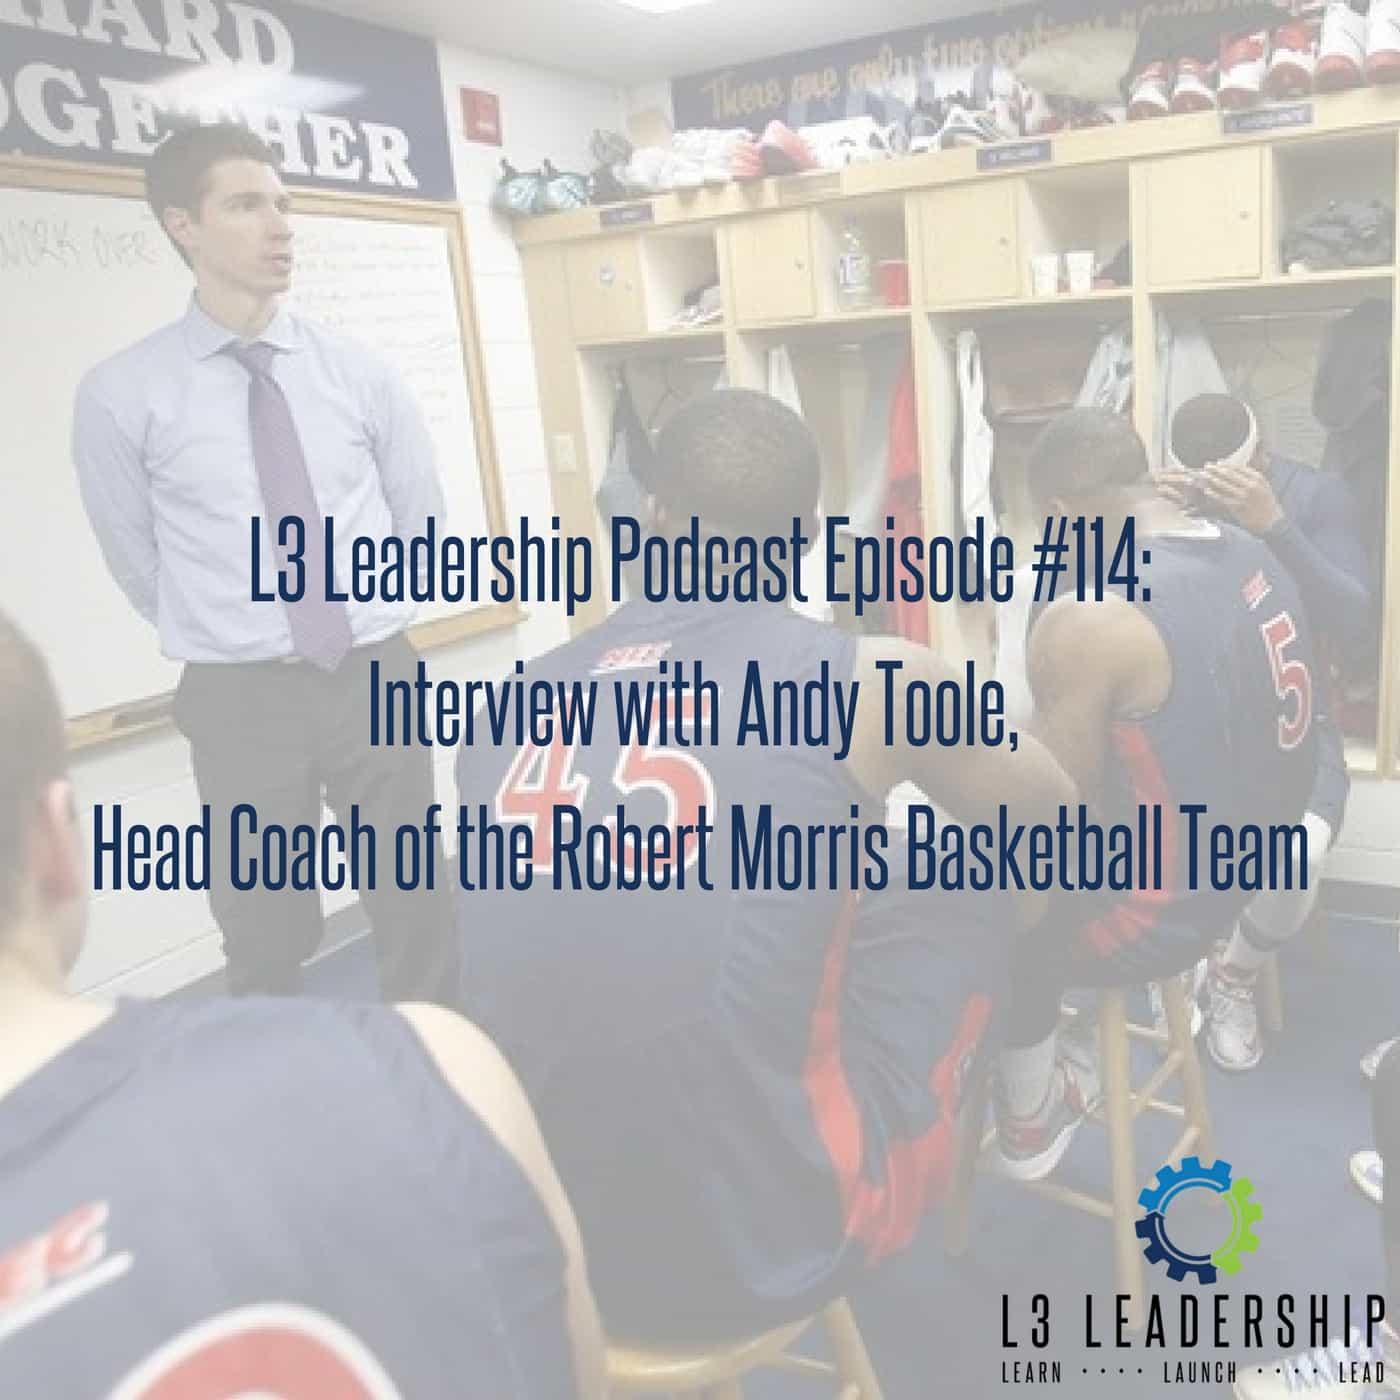 interview coach andy toole robert morris university interview coach andy toole robert morris university basketballl3 leadership